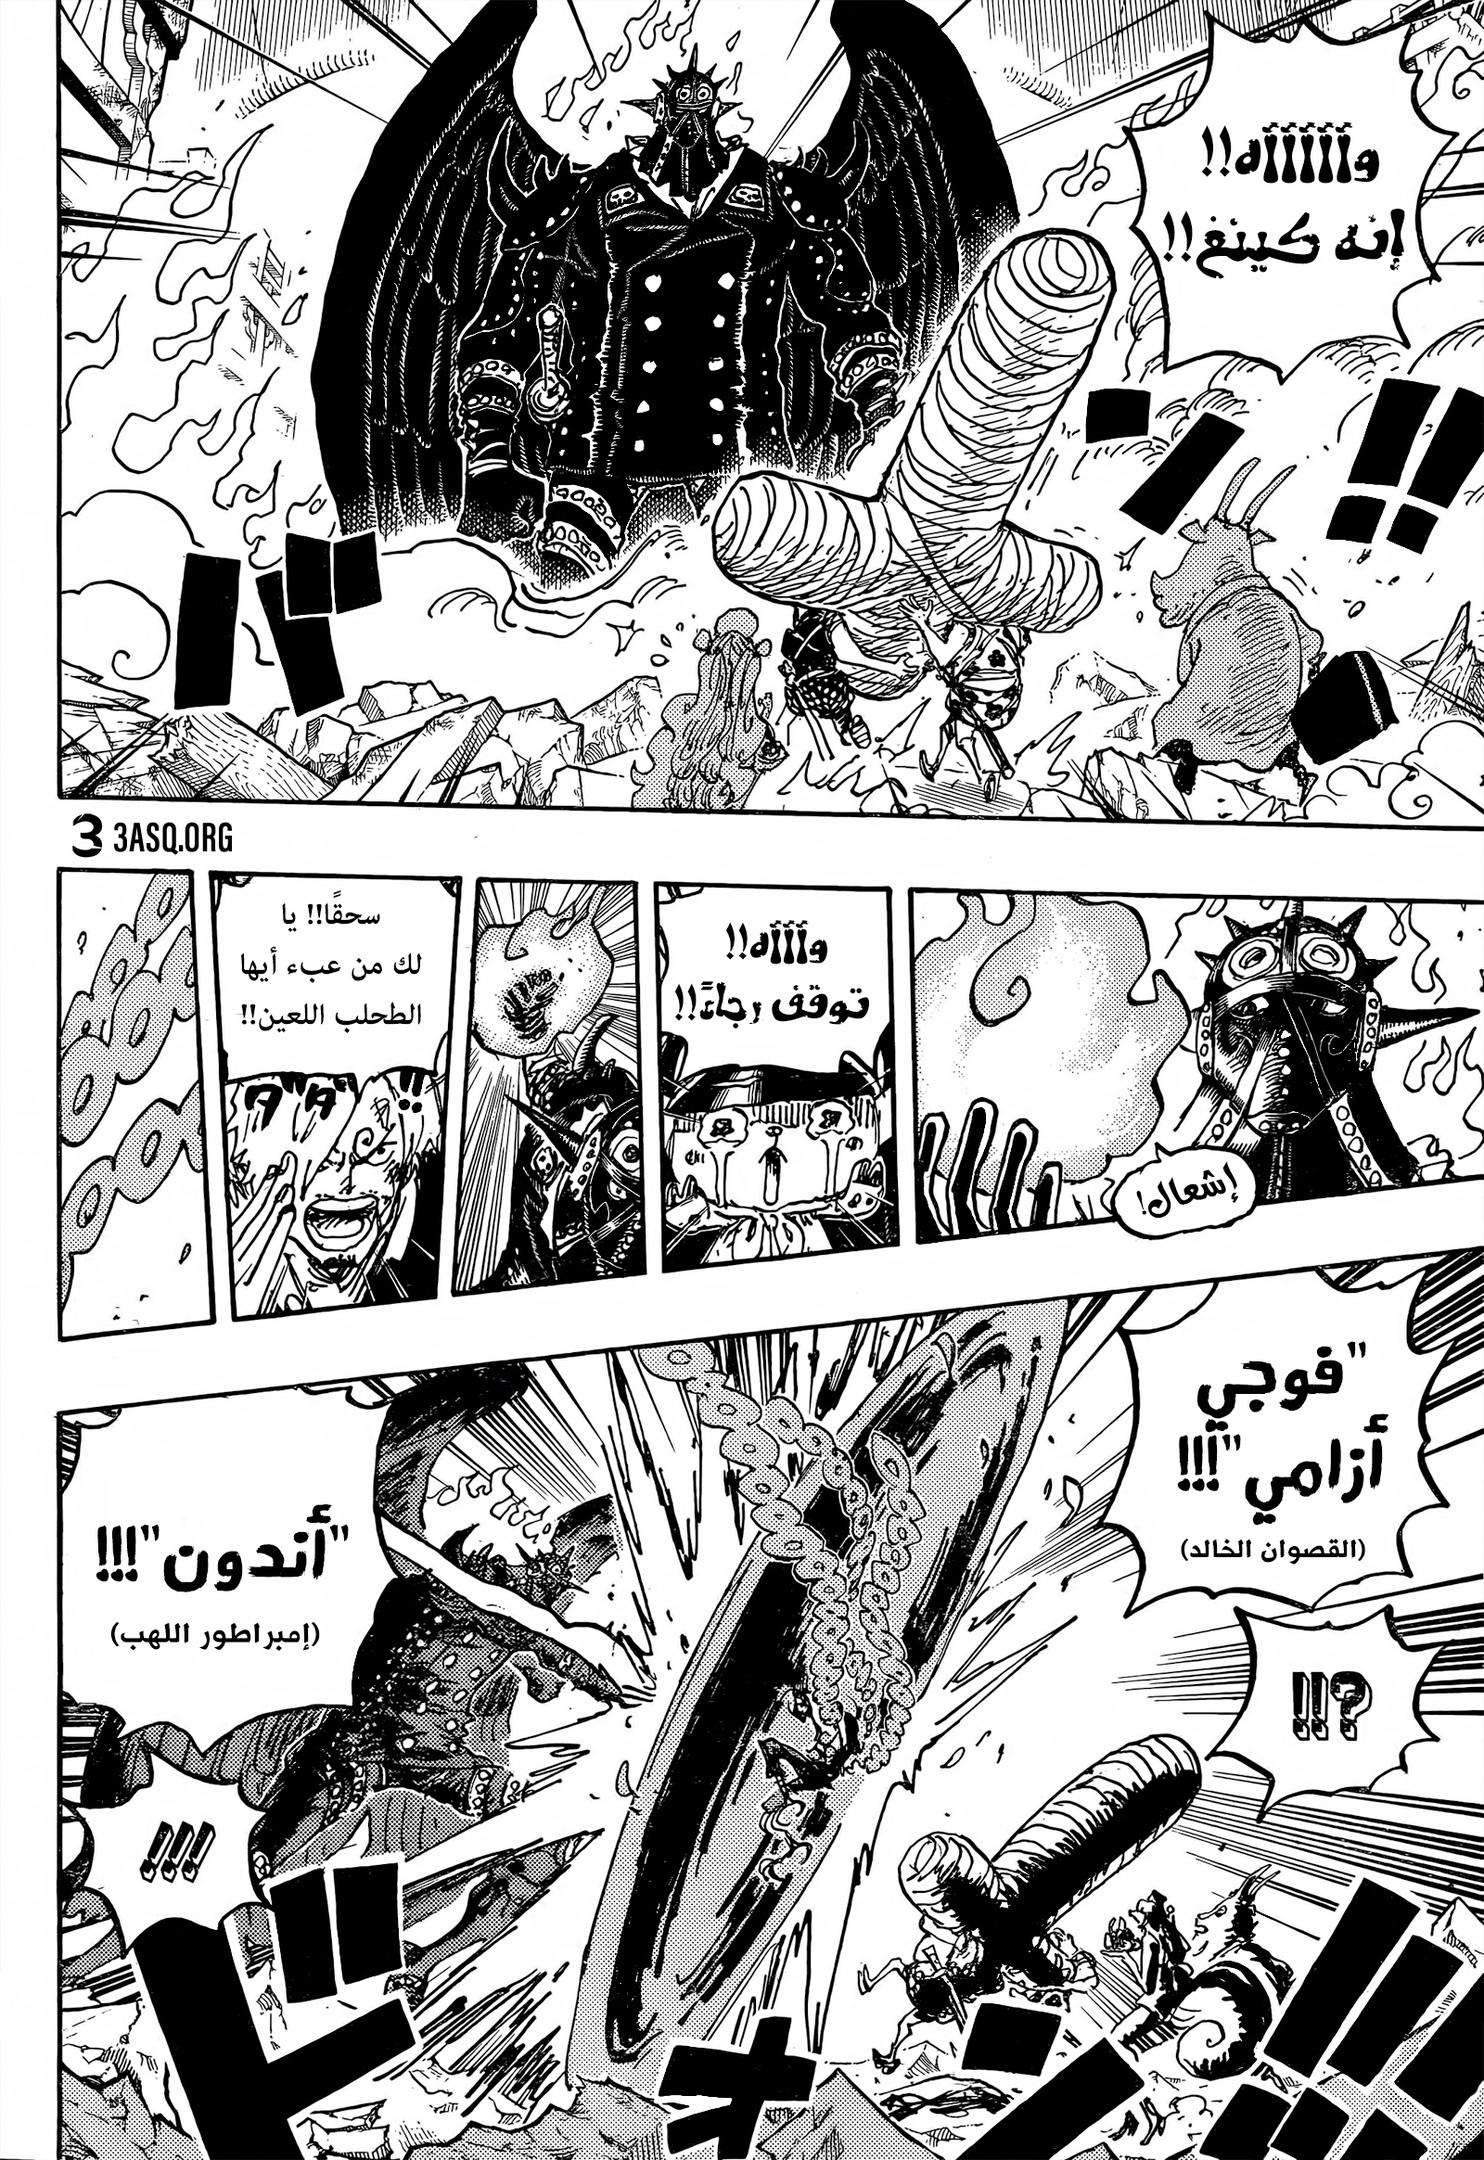 One Piece Arab 1022, image №14